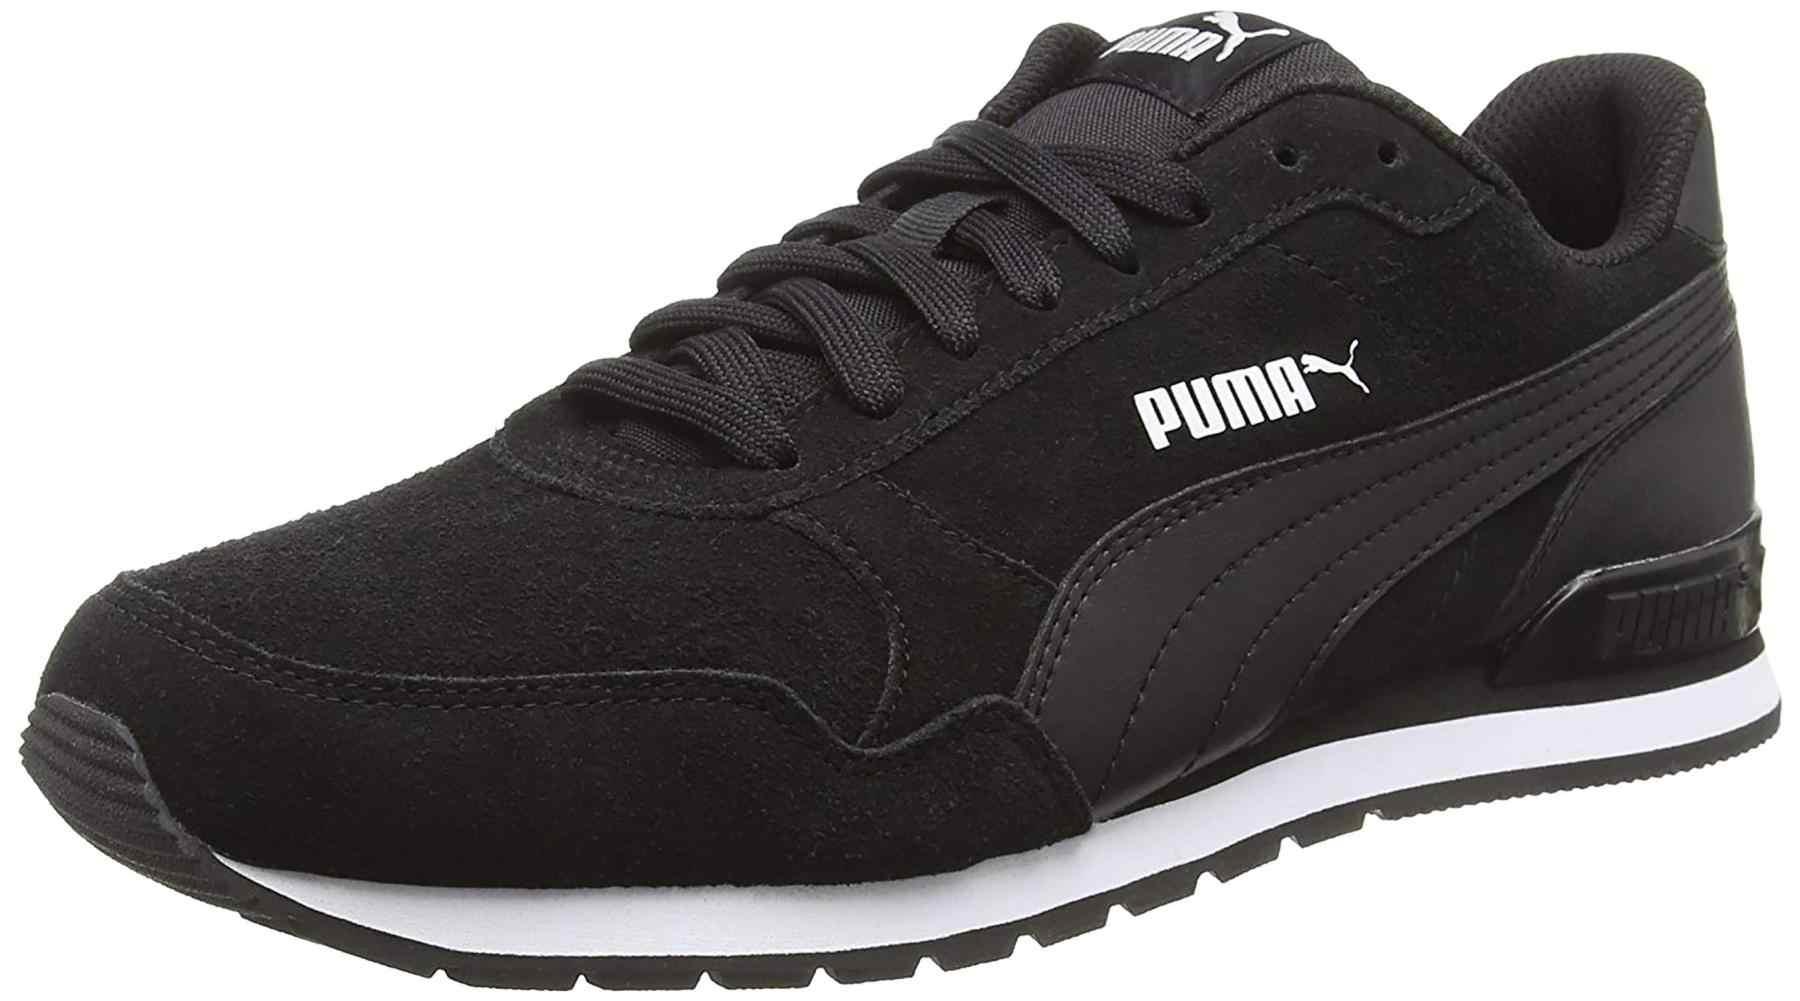 PUMA ST RUNNER V2 SD MAN'S BLACK SPORT SHOES 36527901